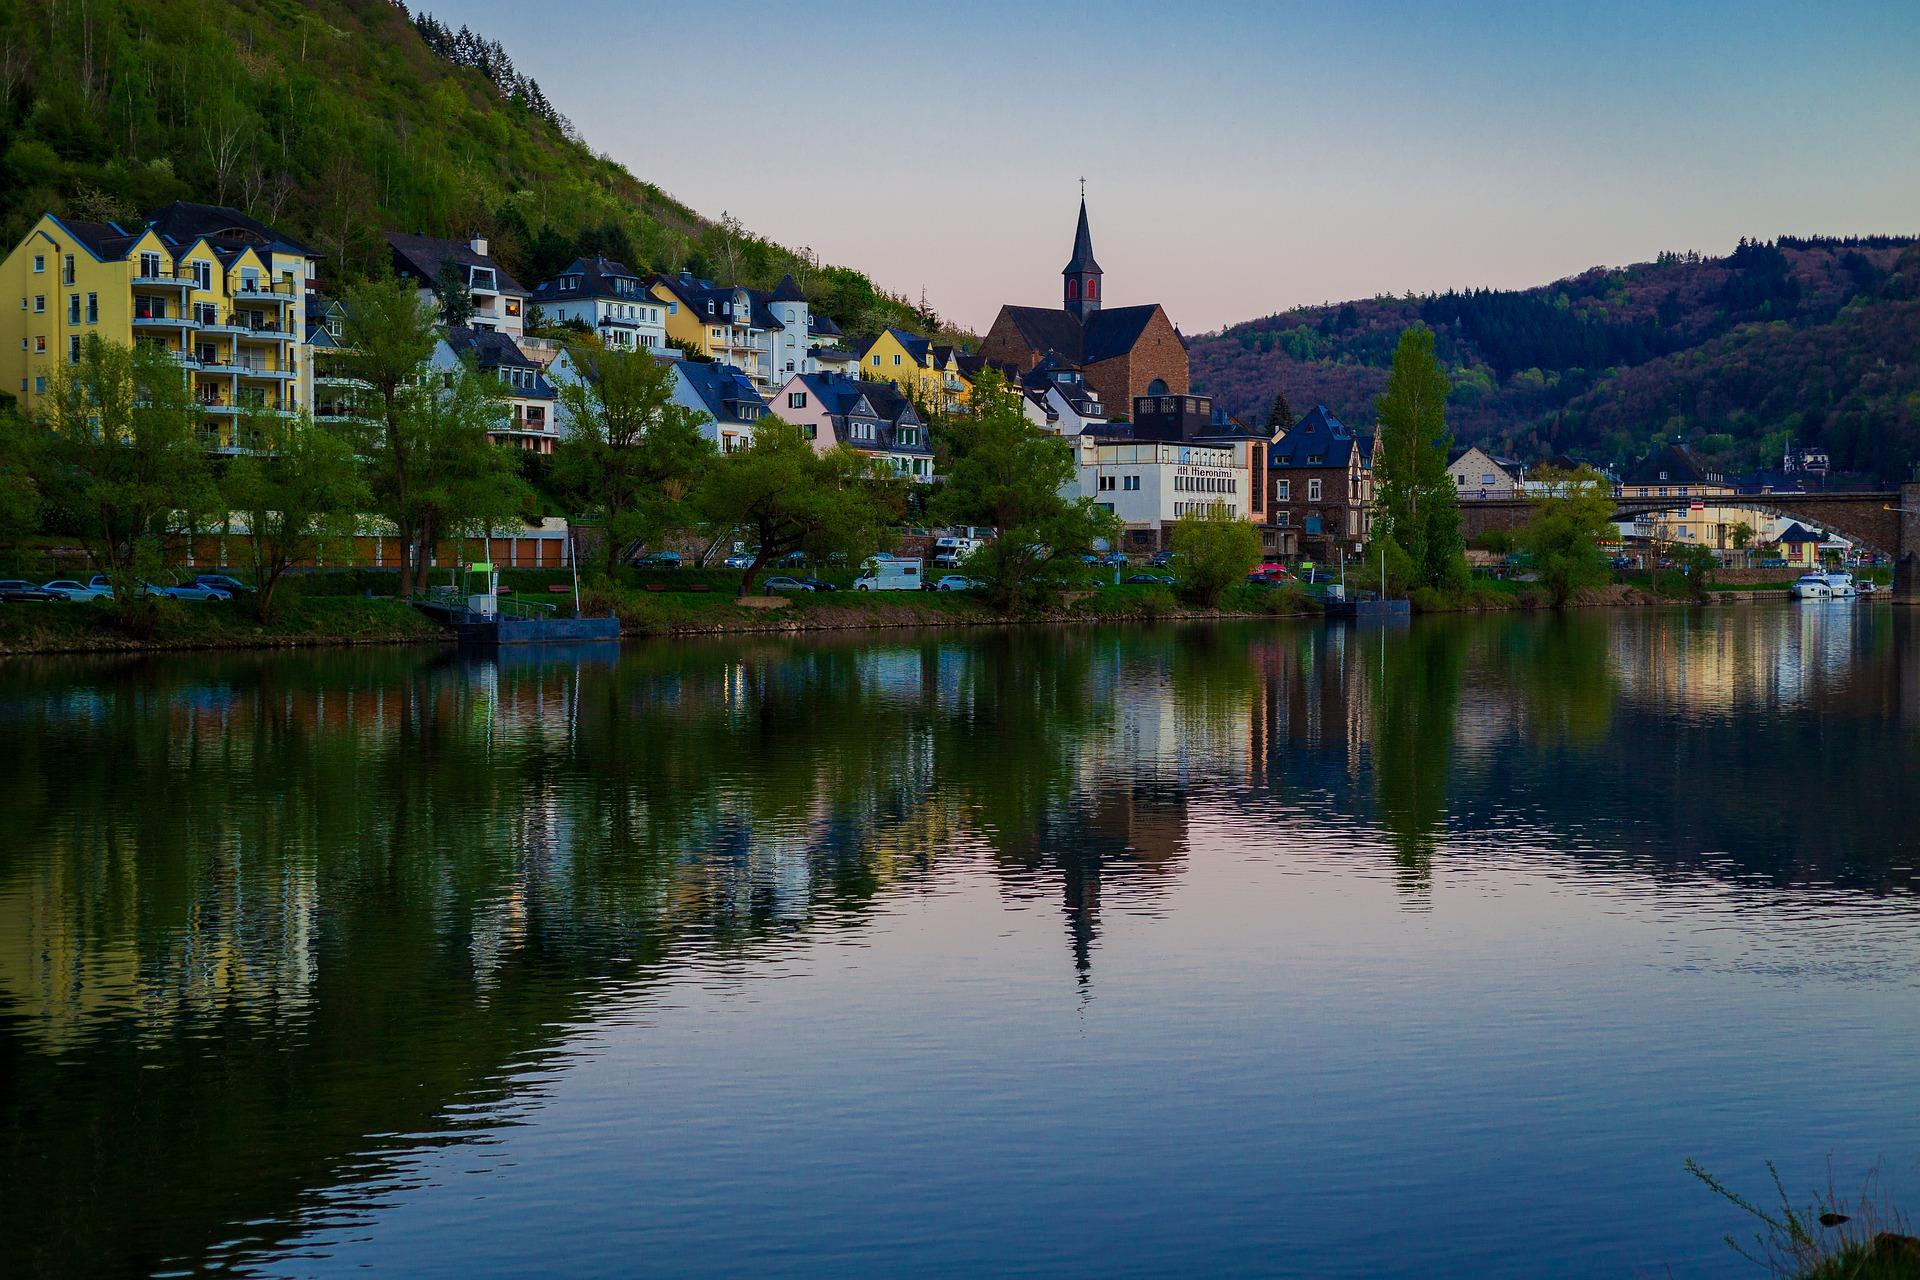 WBS Rheinland Pfalz